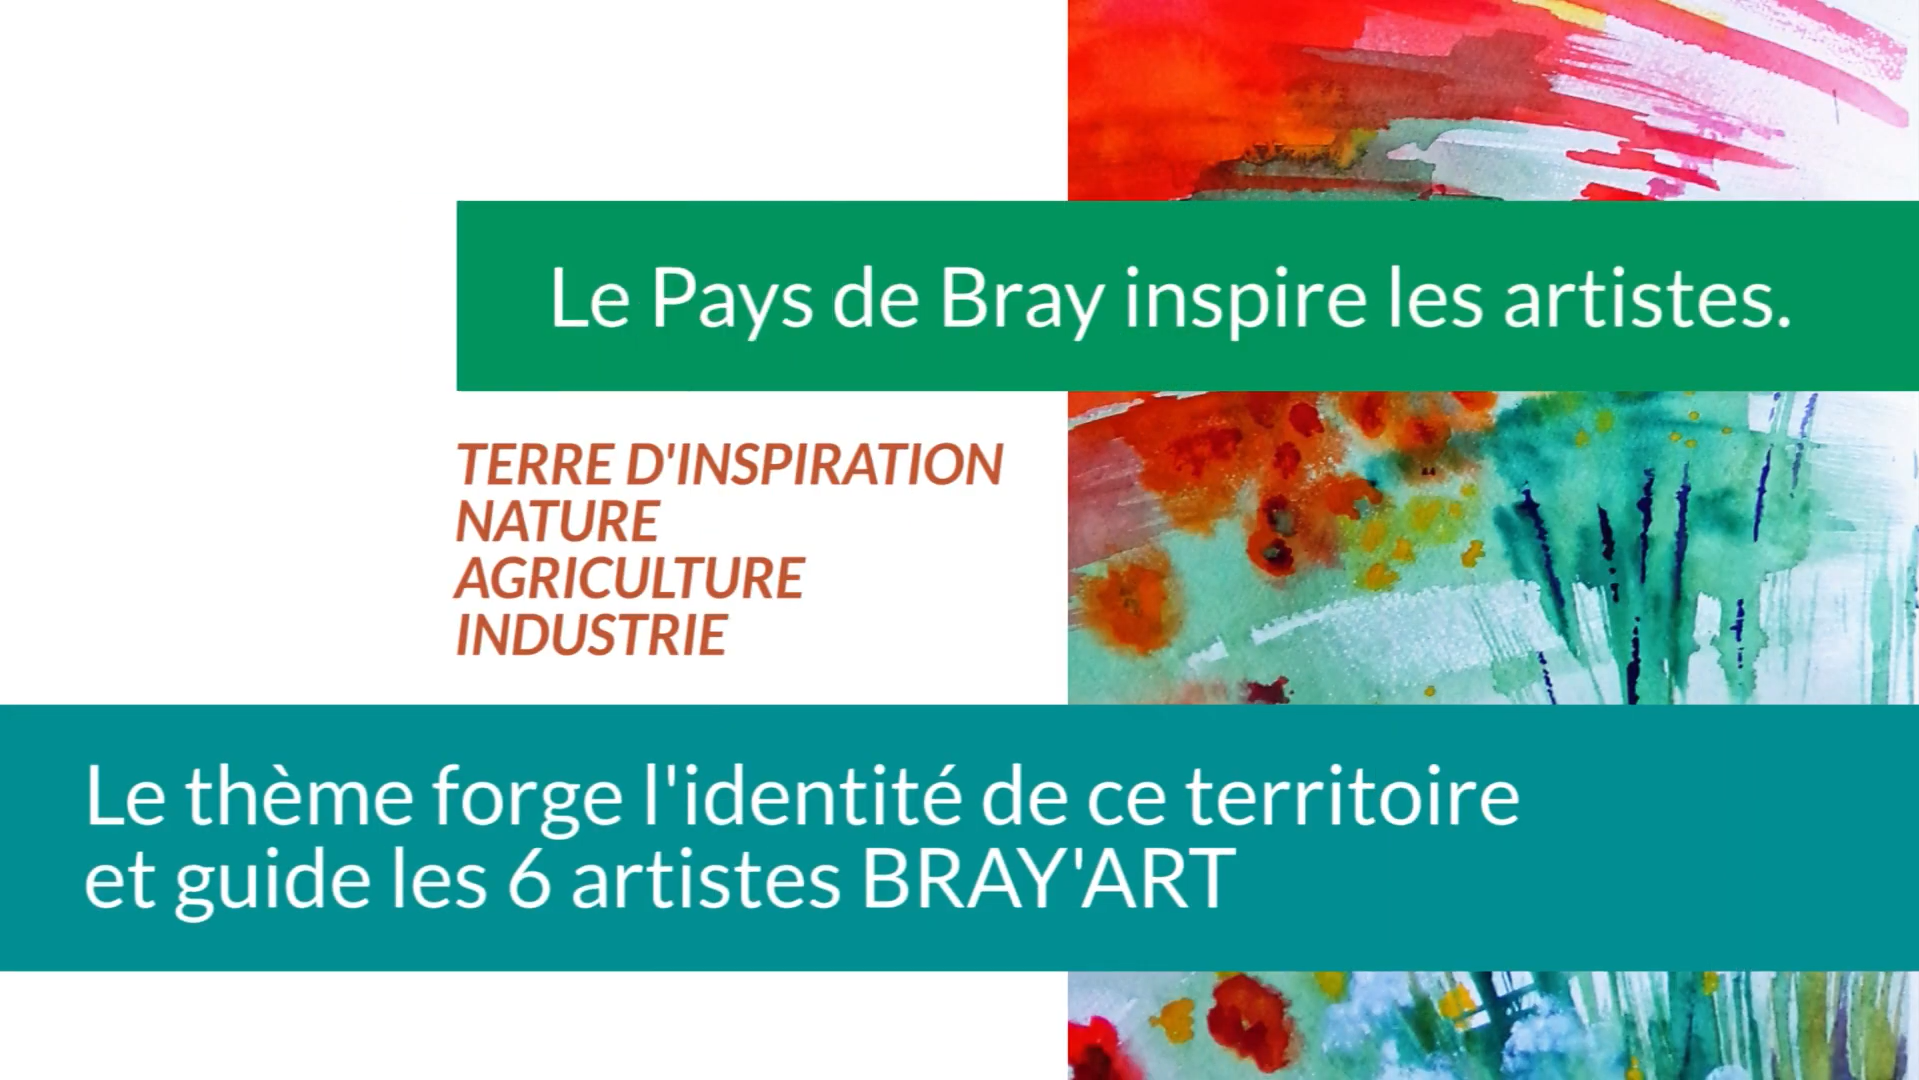 BrayArt inspire les artistes